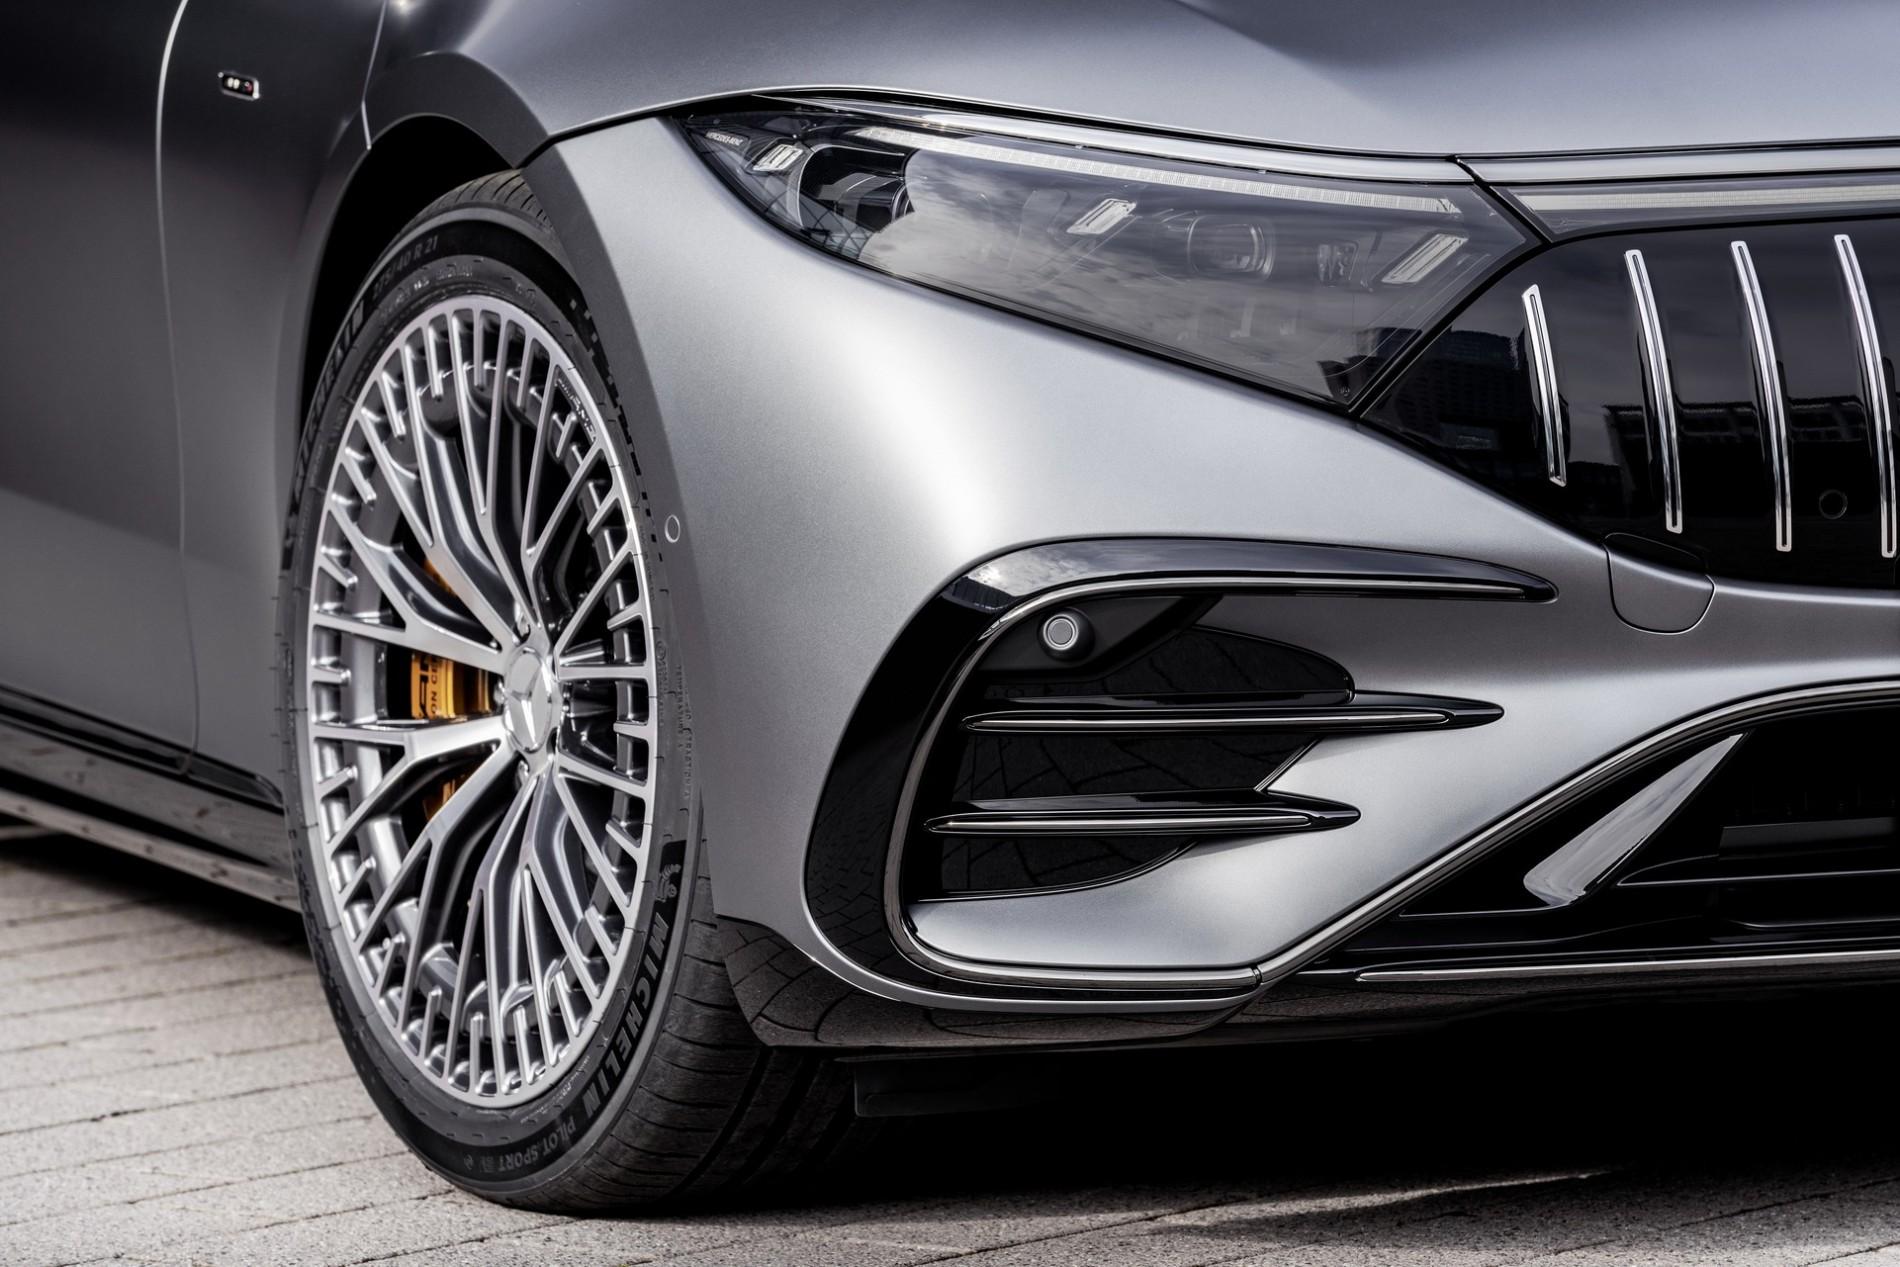 Mercedes-AMG EQS 53 4MATIC+ - Mercedes-AMG EQS 53 4MATIC+